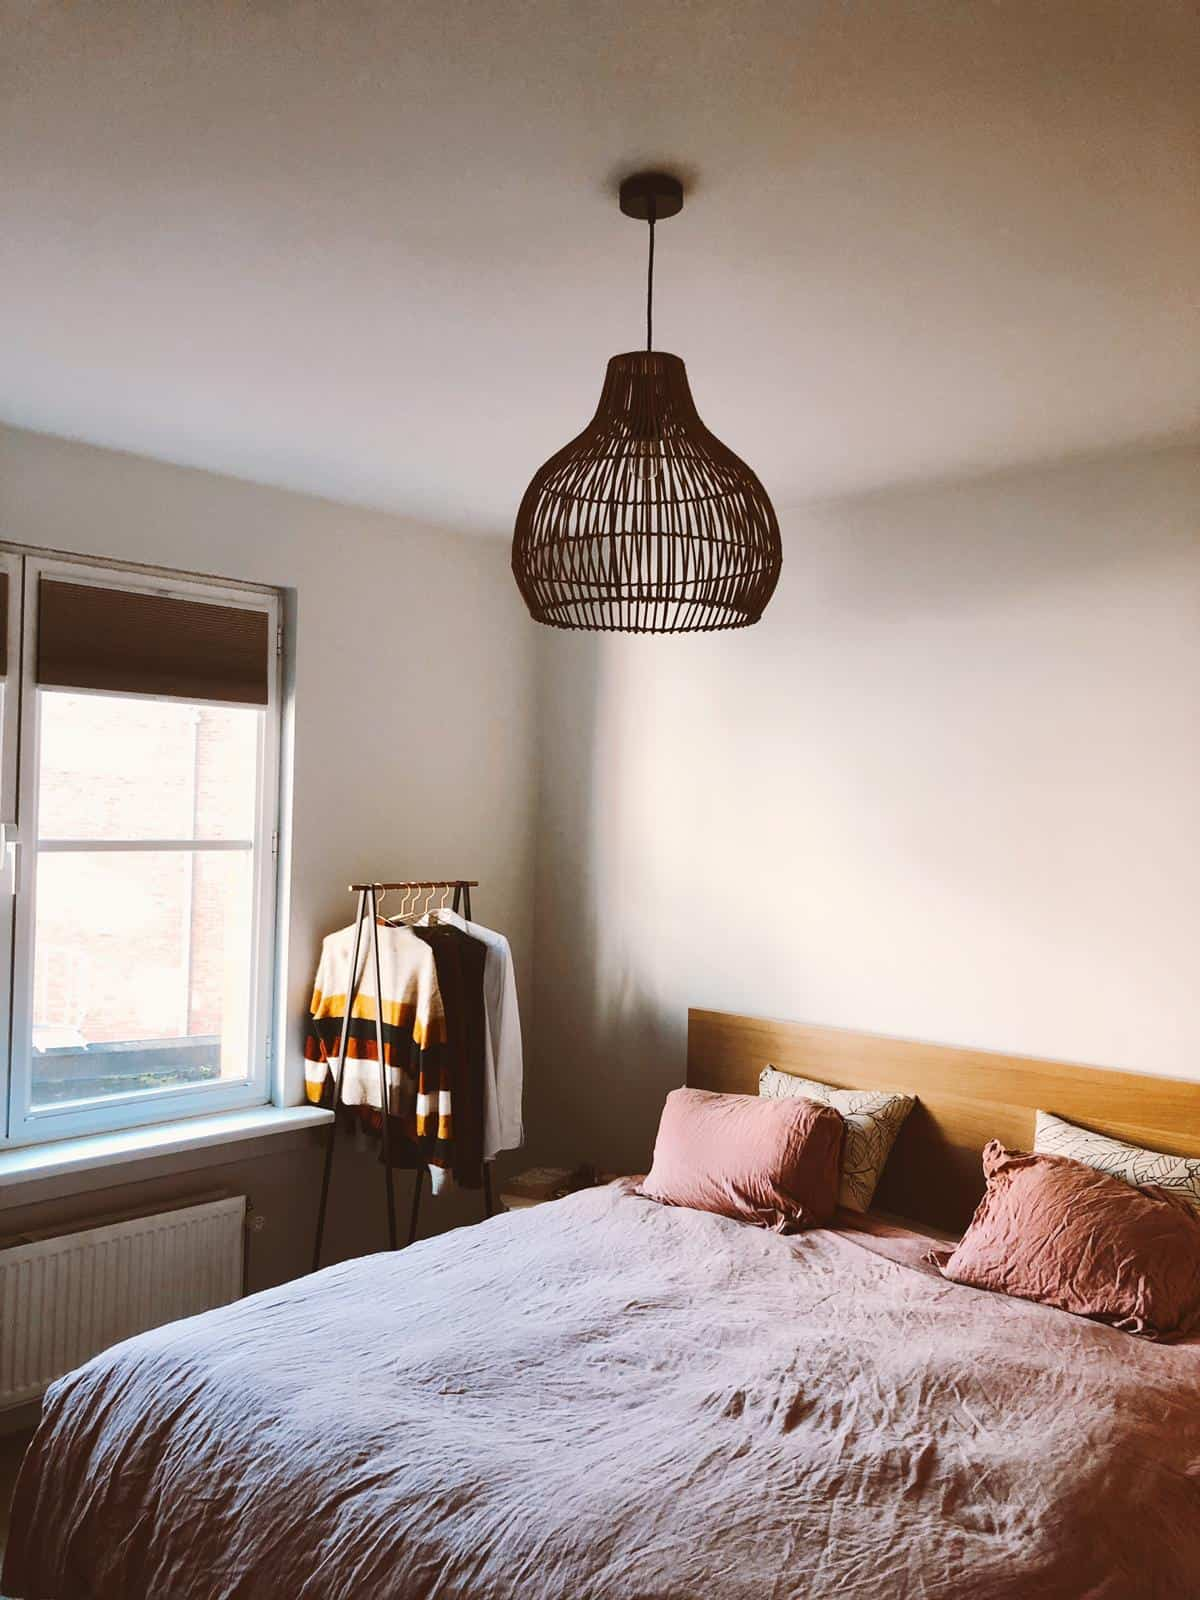 kijkje in onze slaapkamer